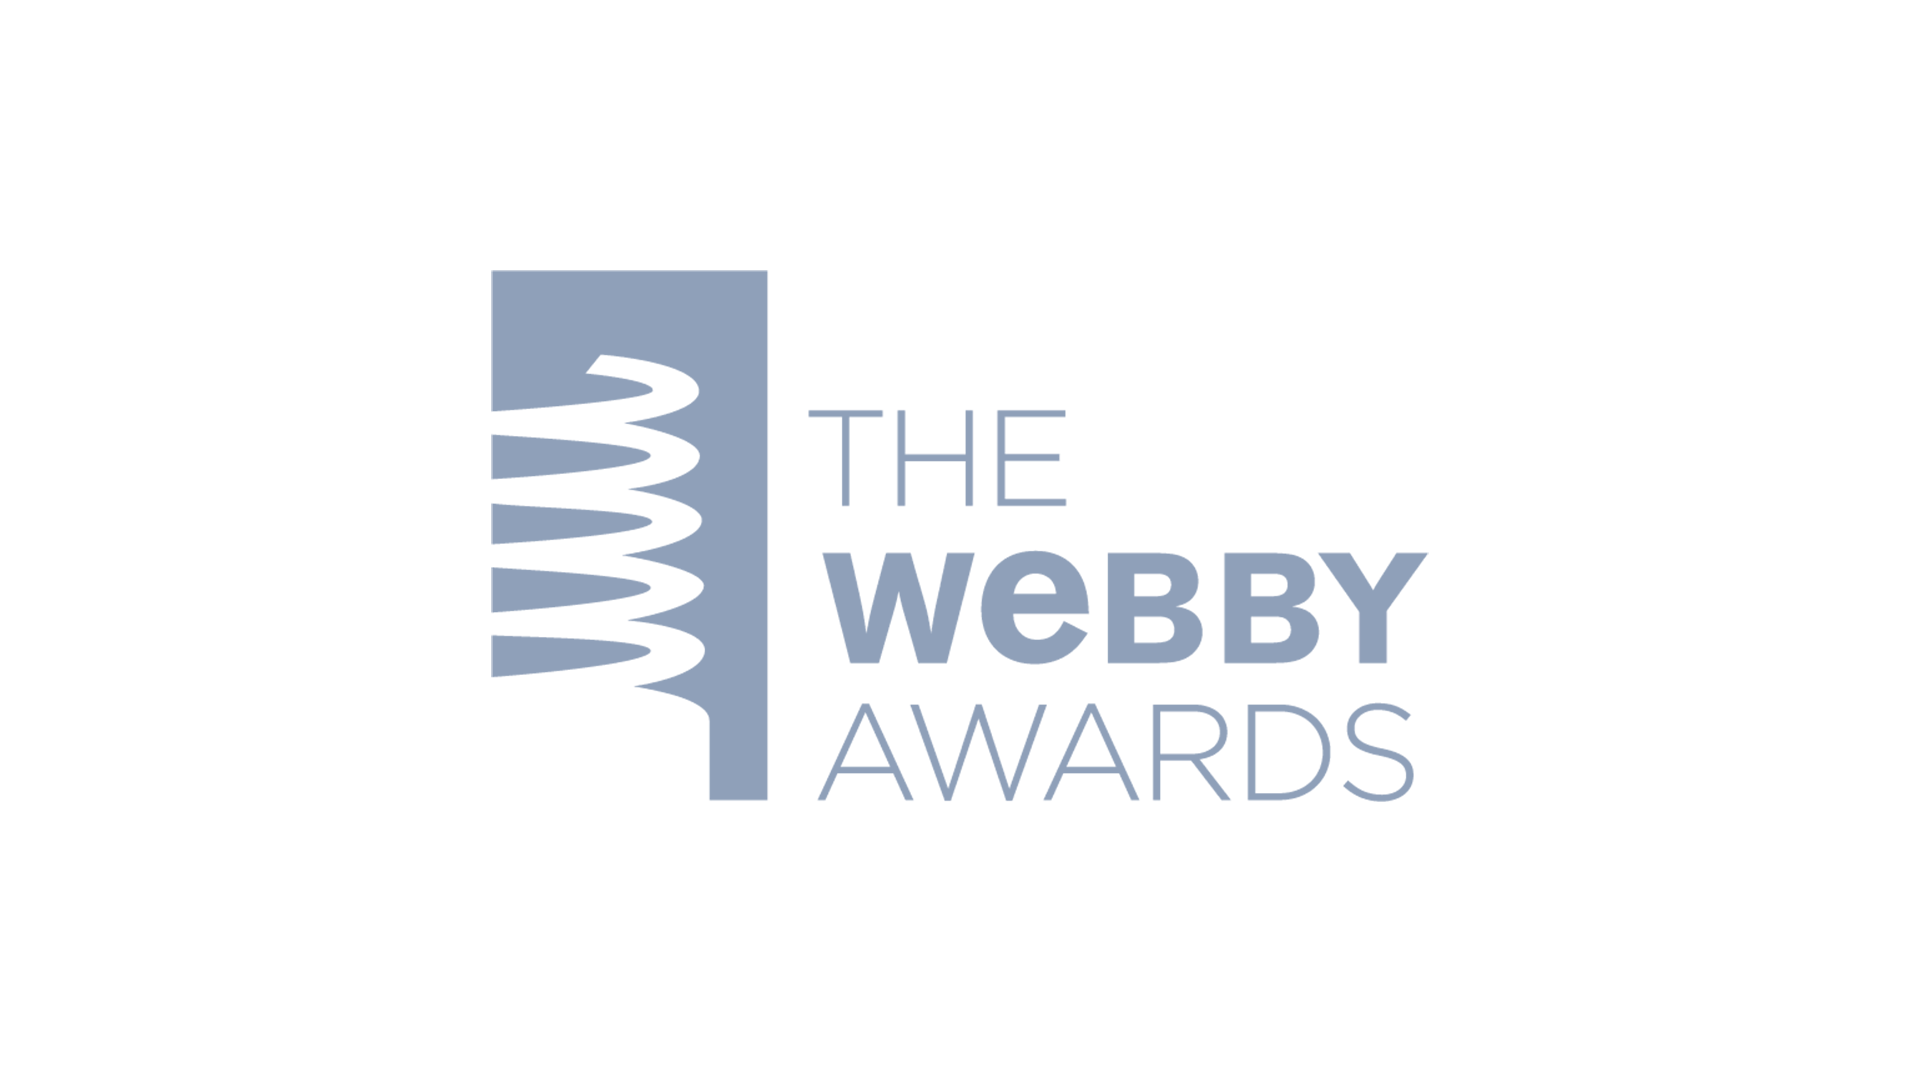 awards_logo_07